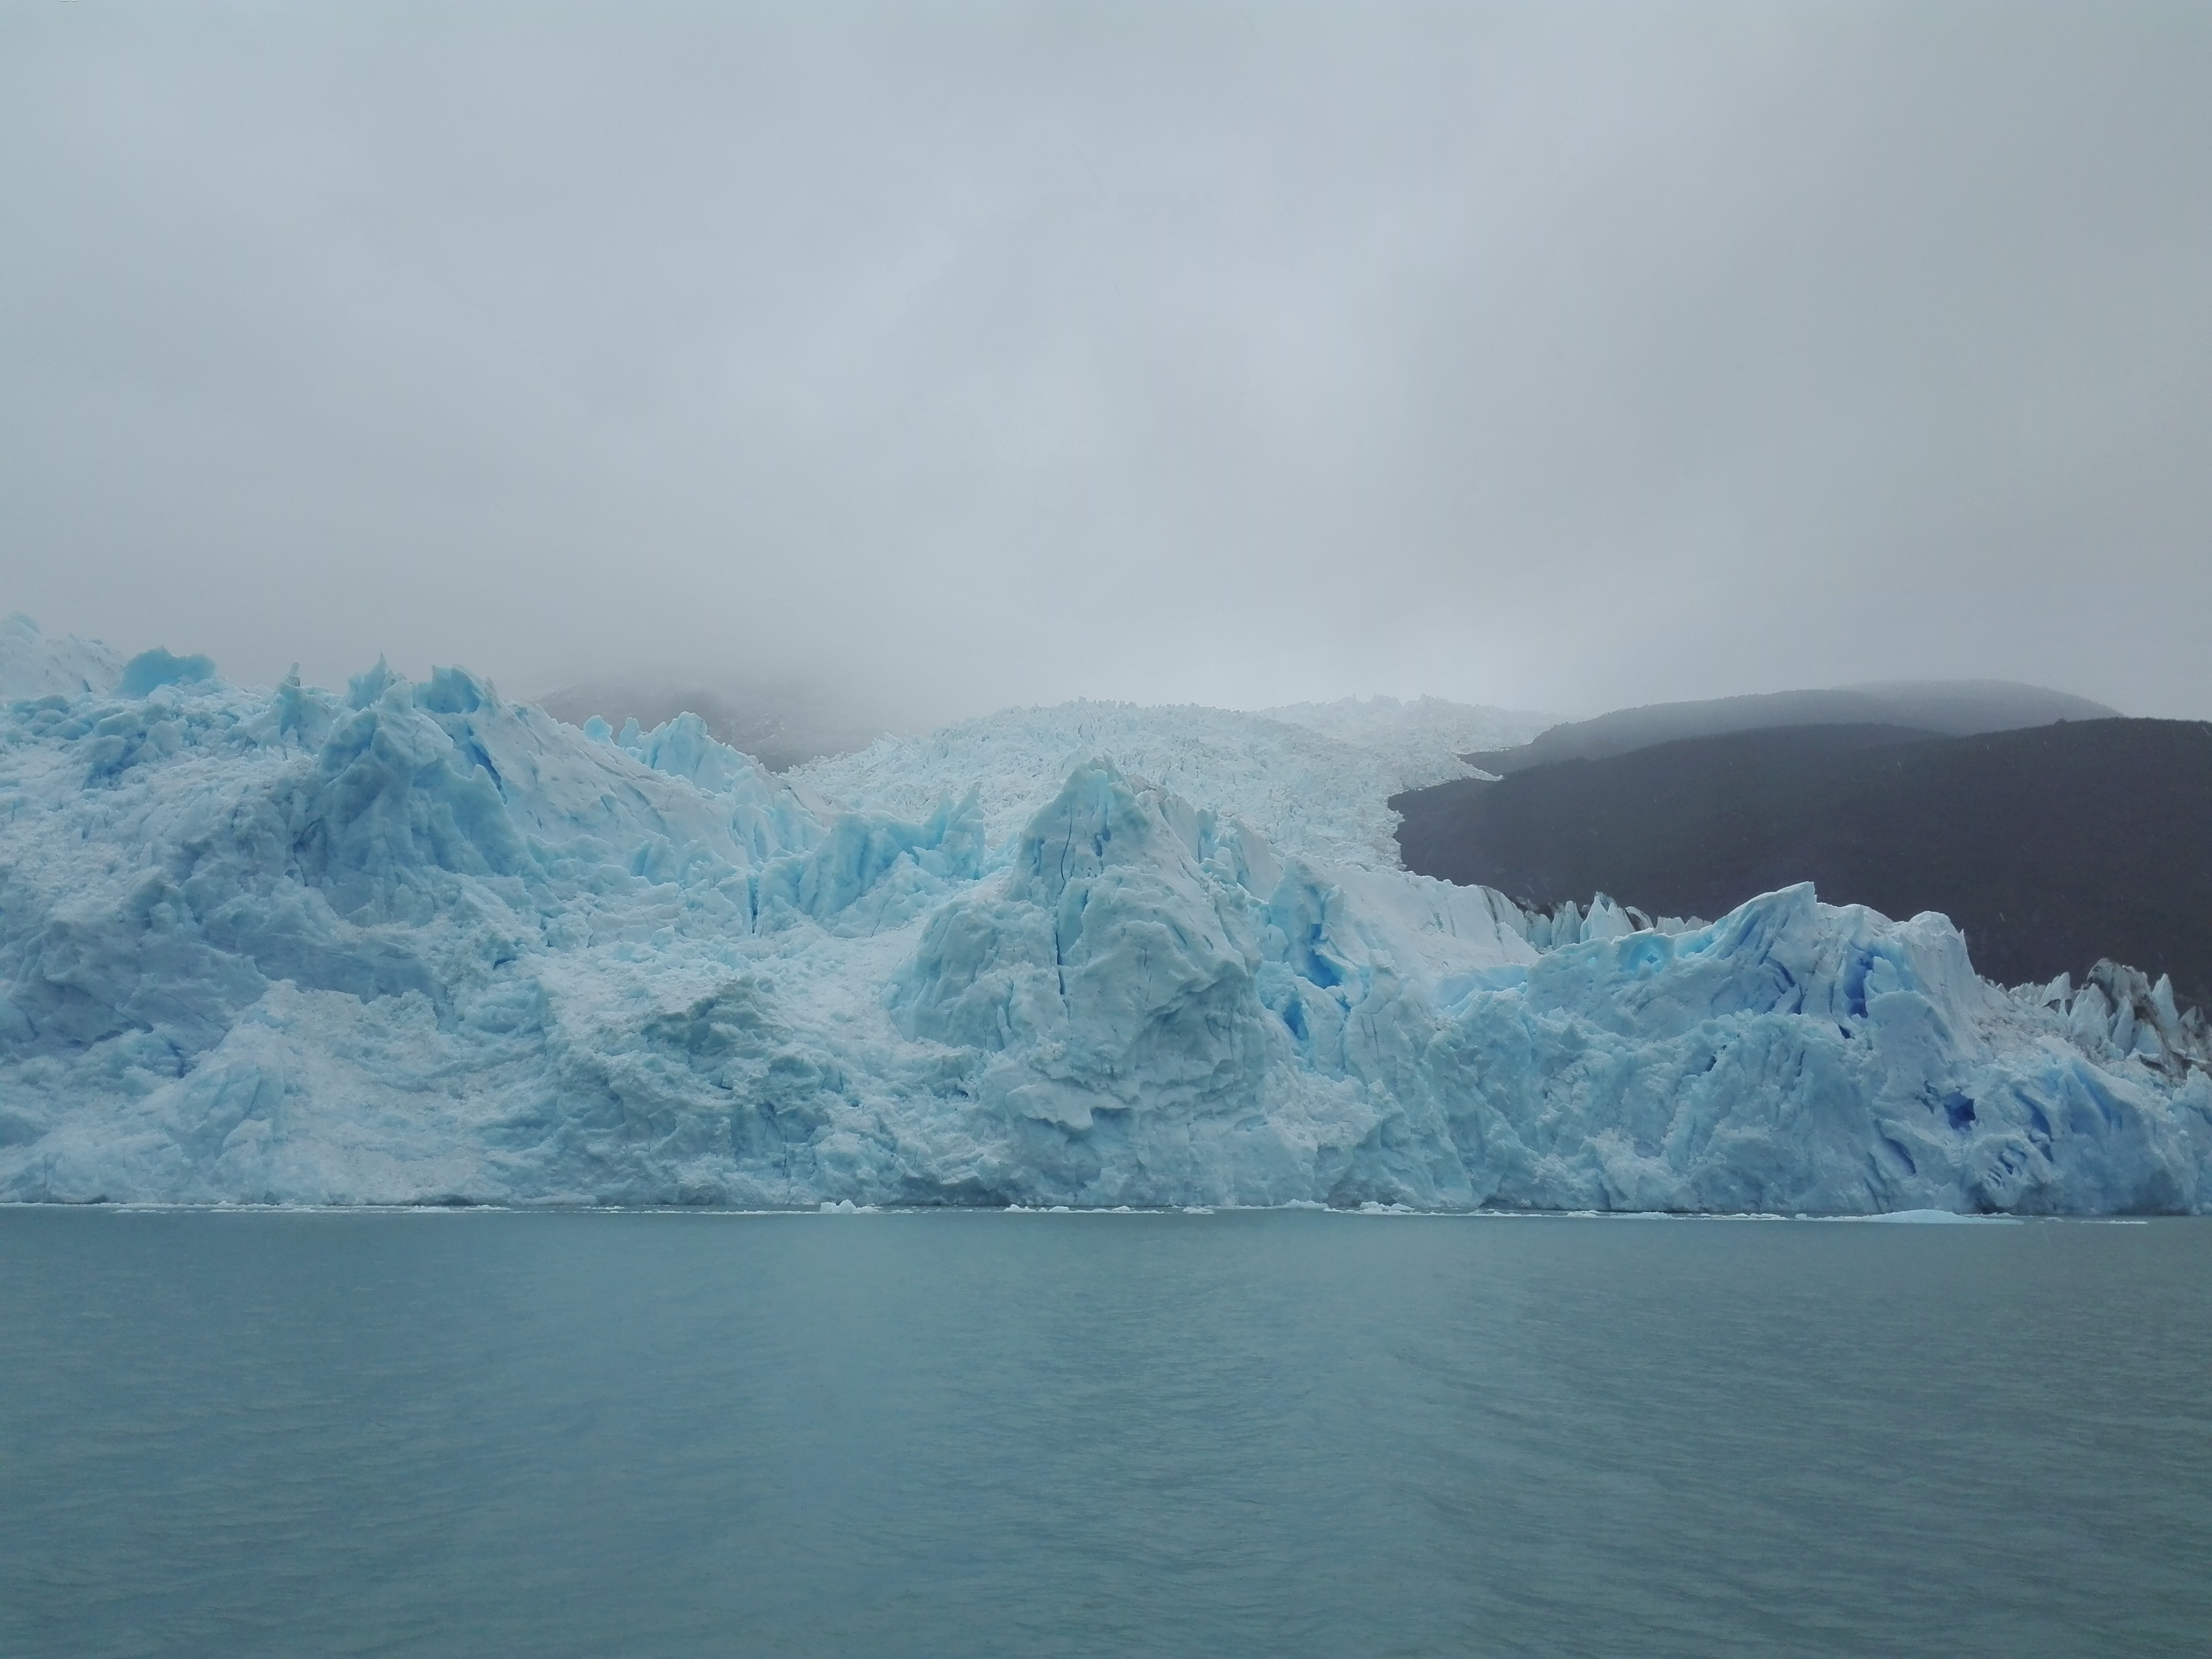 Argentine lago Argentino glacier Upsala.